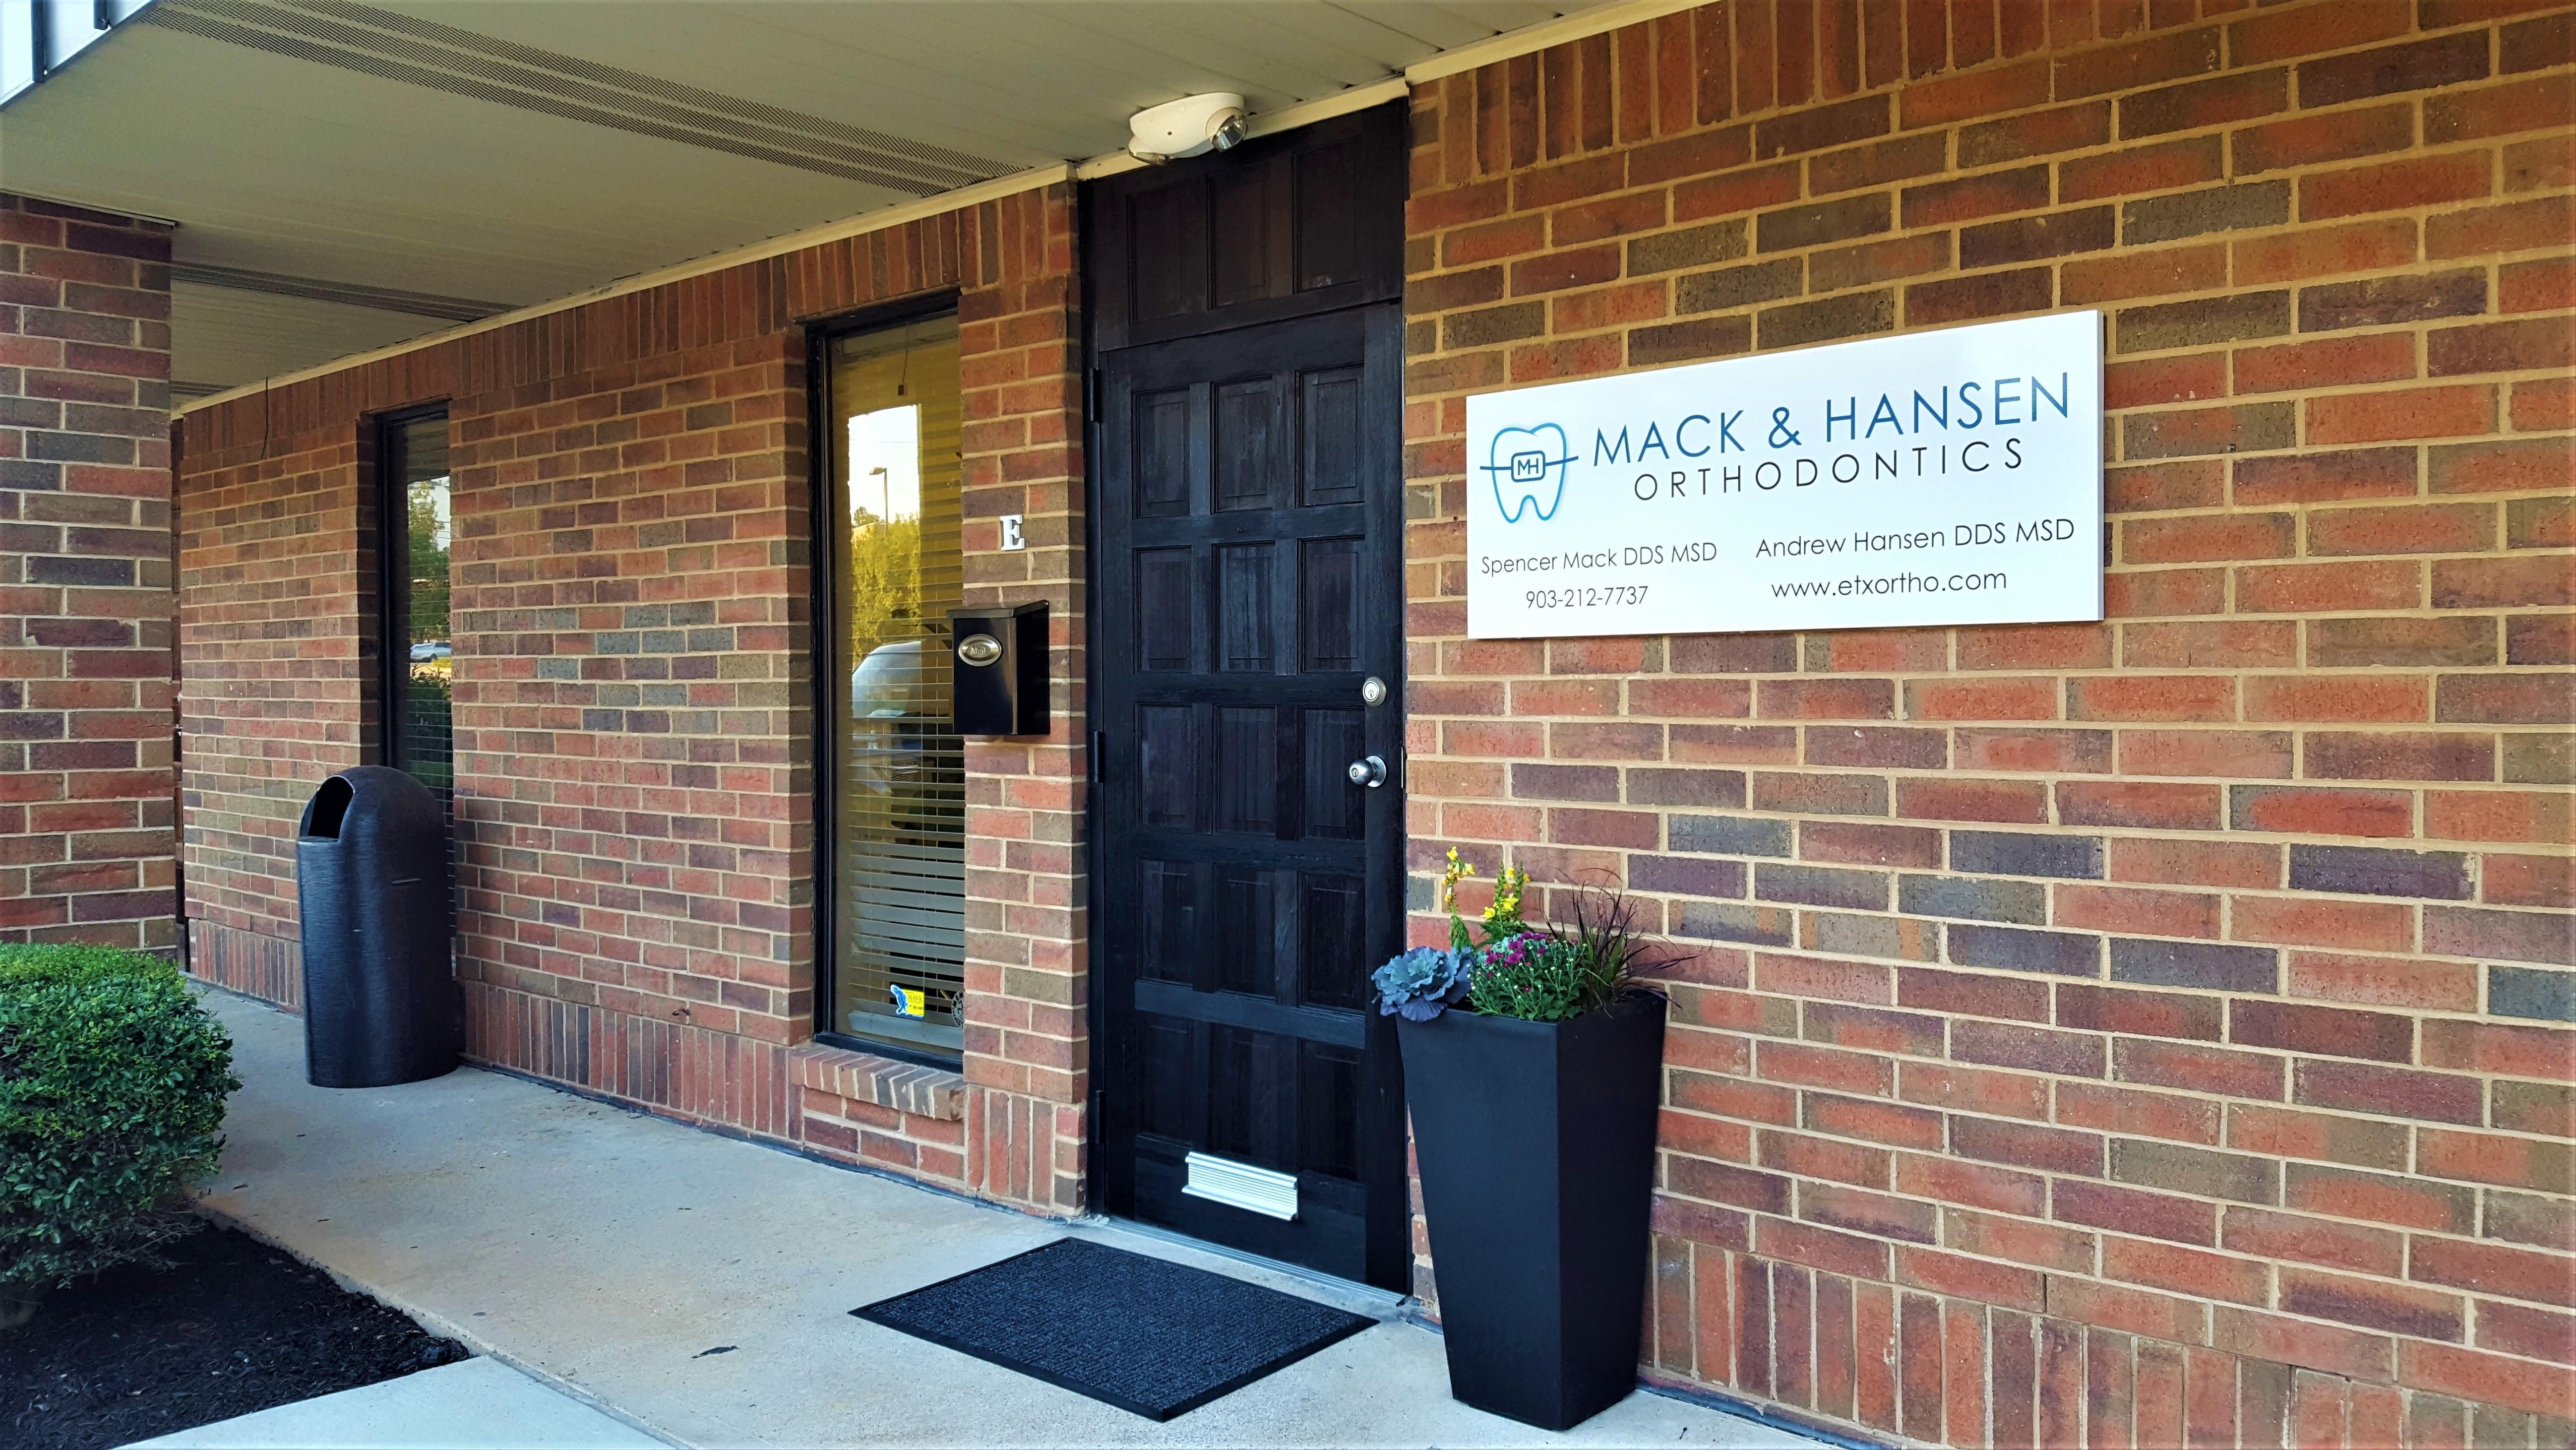 Mack and Hansen Orthodontics image 2